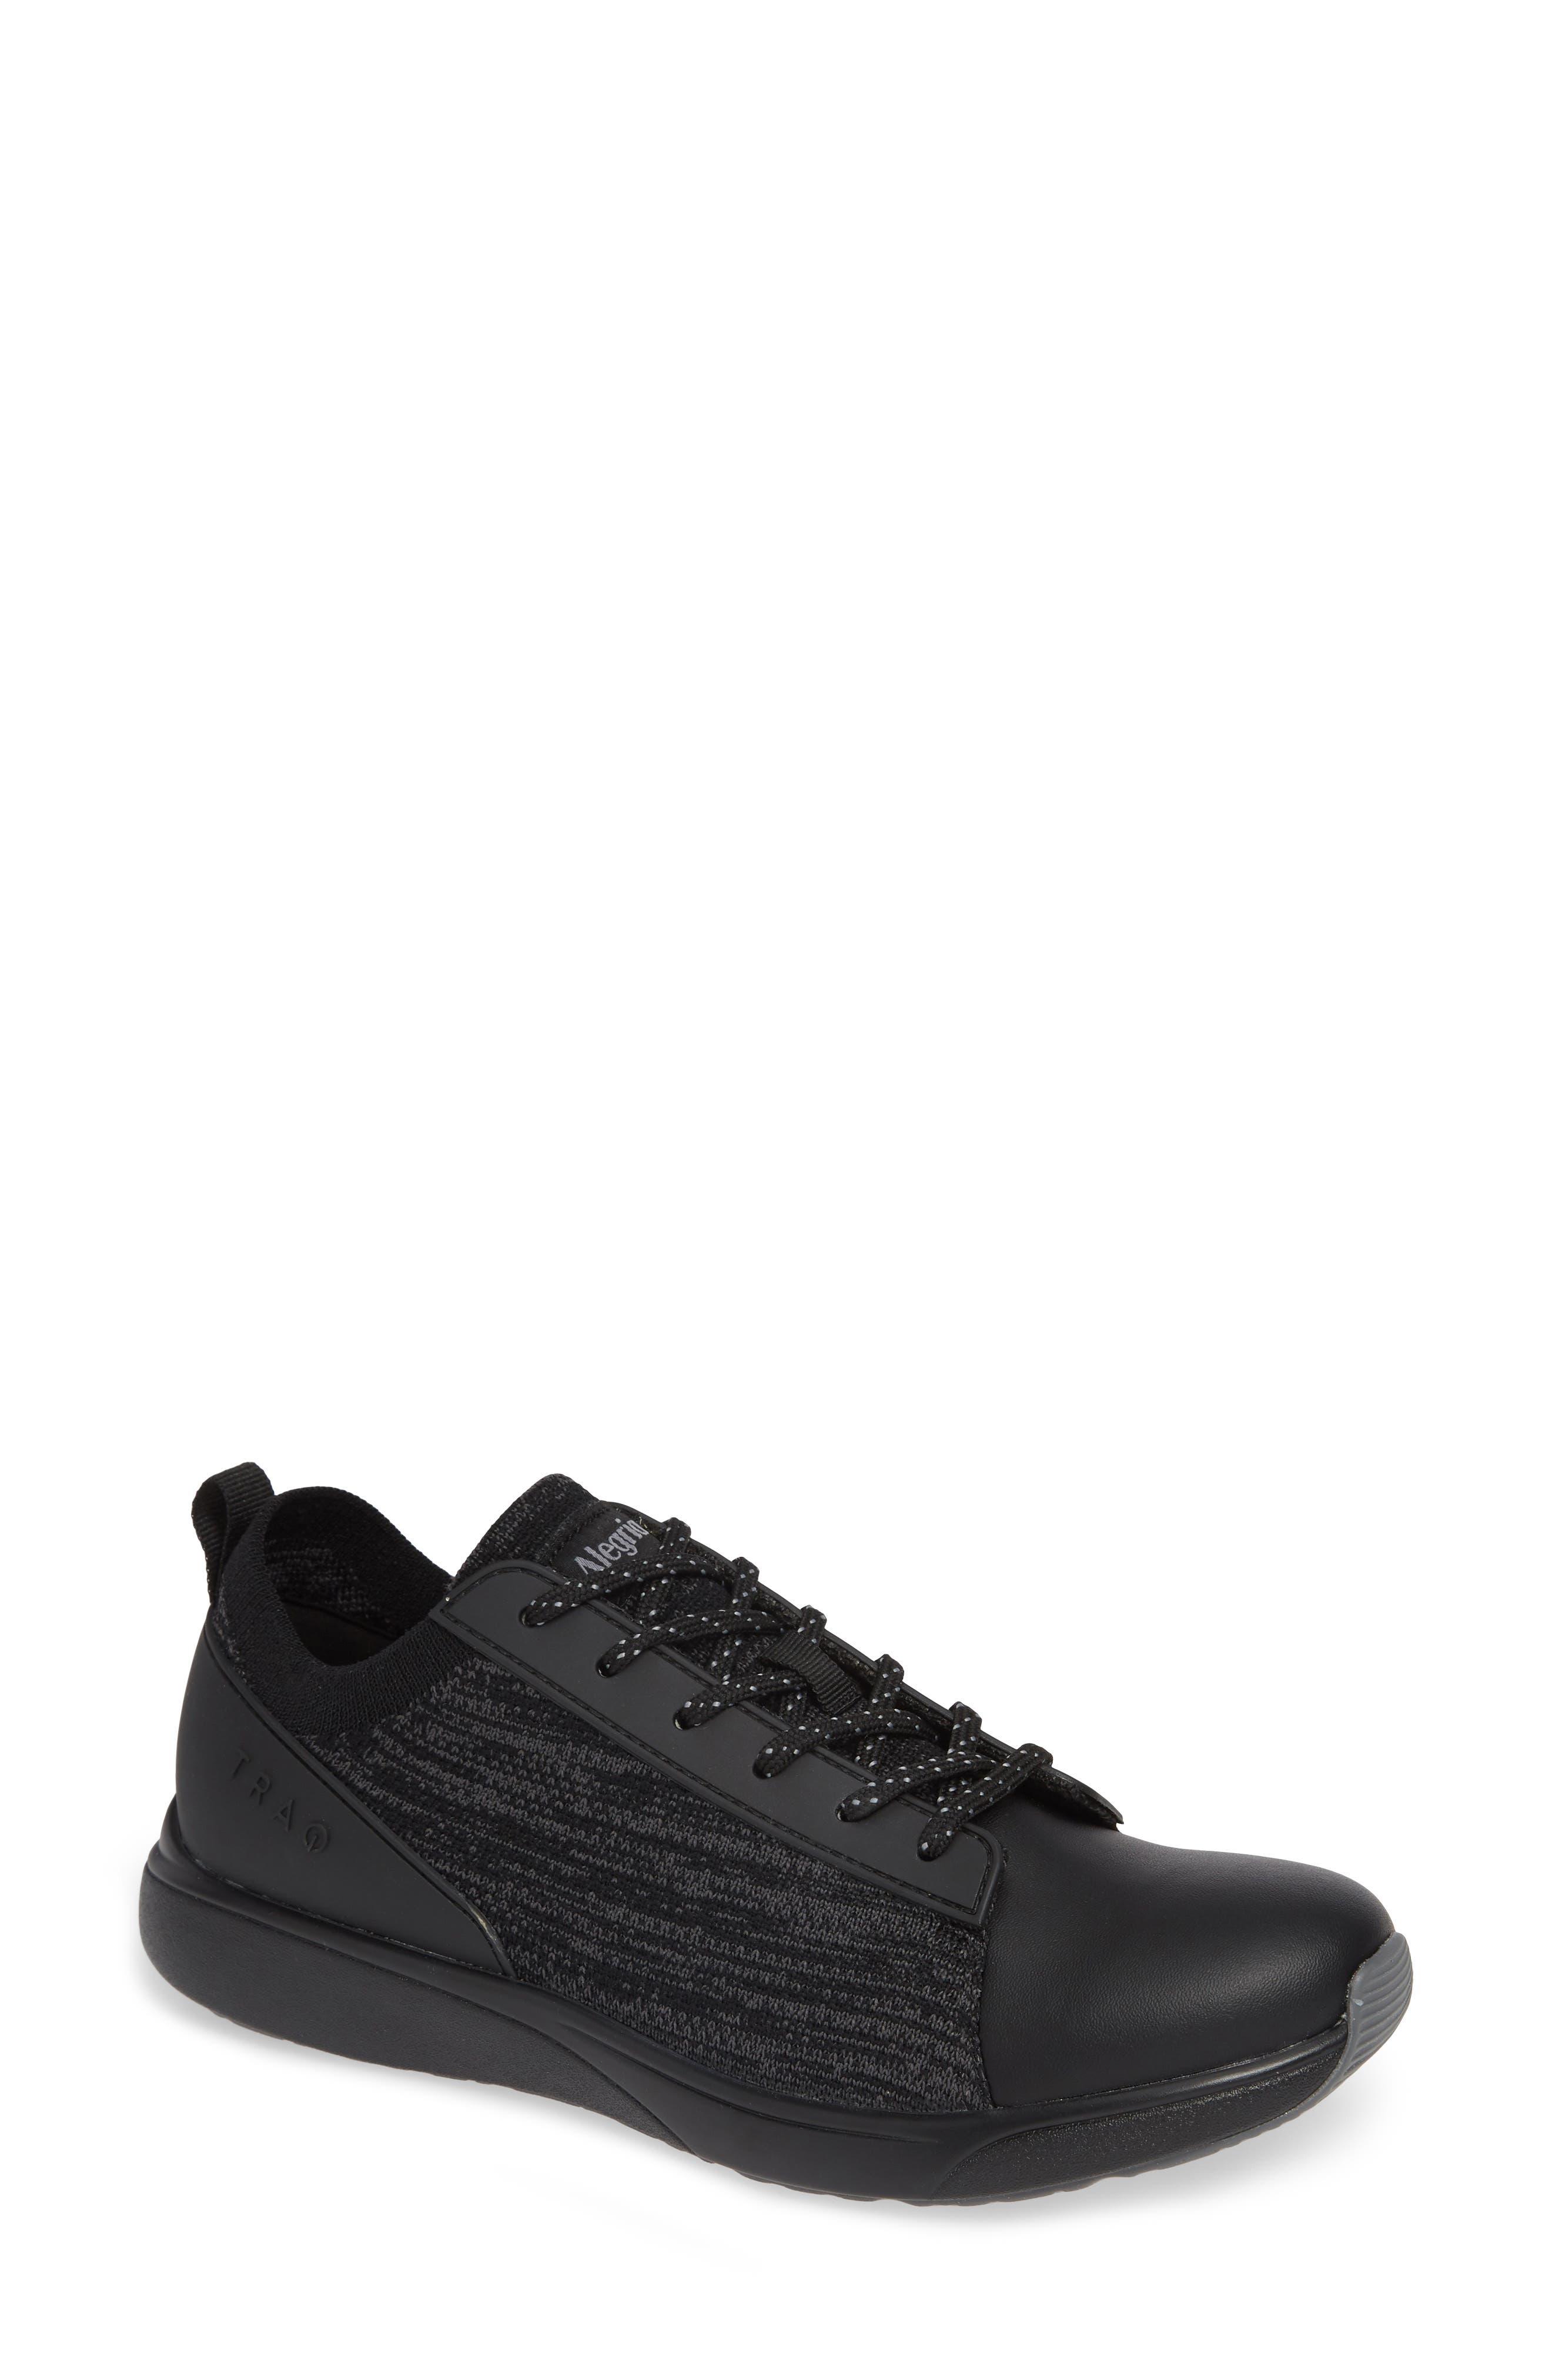 ALEGRIA Qest Sneaker, Main, color, BLACK LEATHER